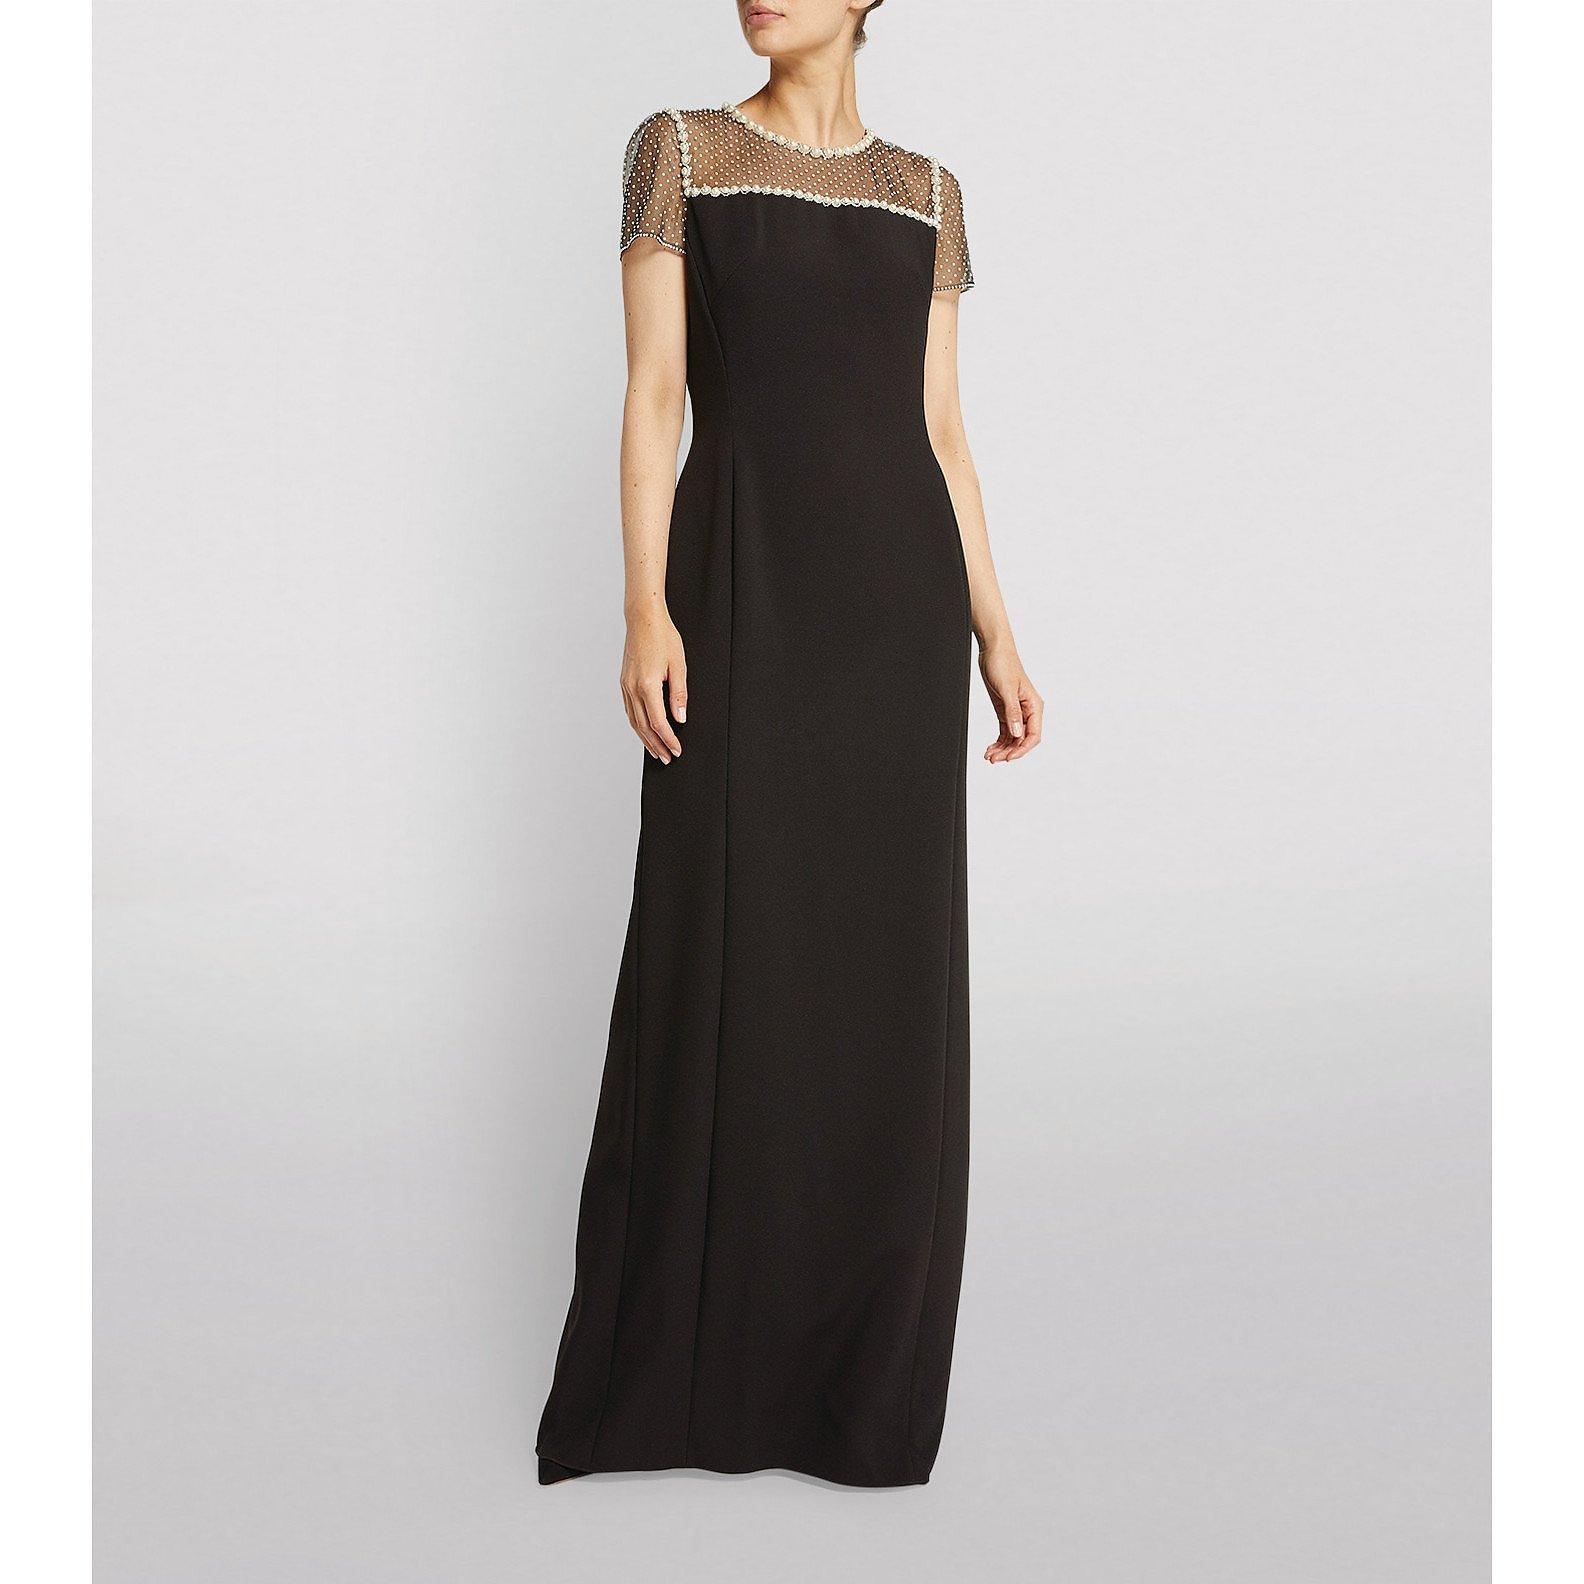 Jenny Packham Pearl-Embellished Adele Gown